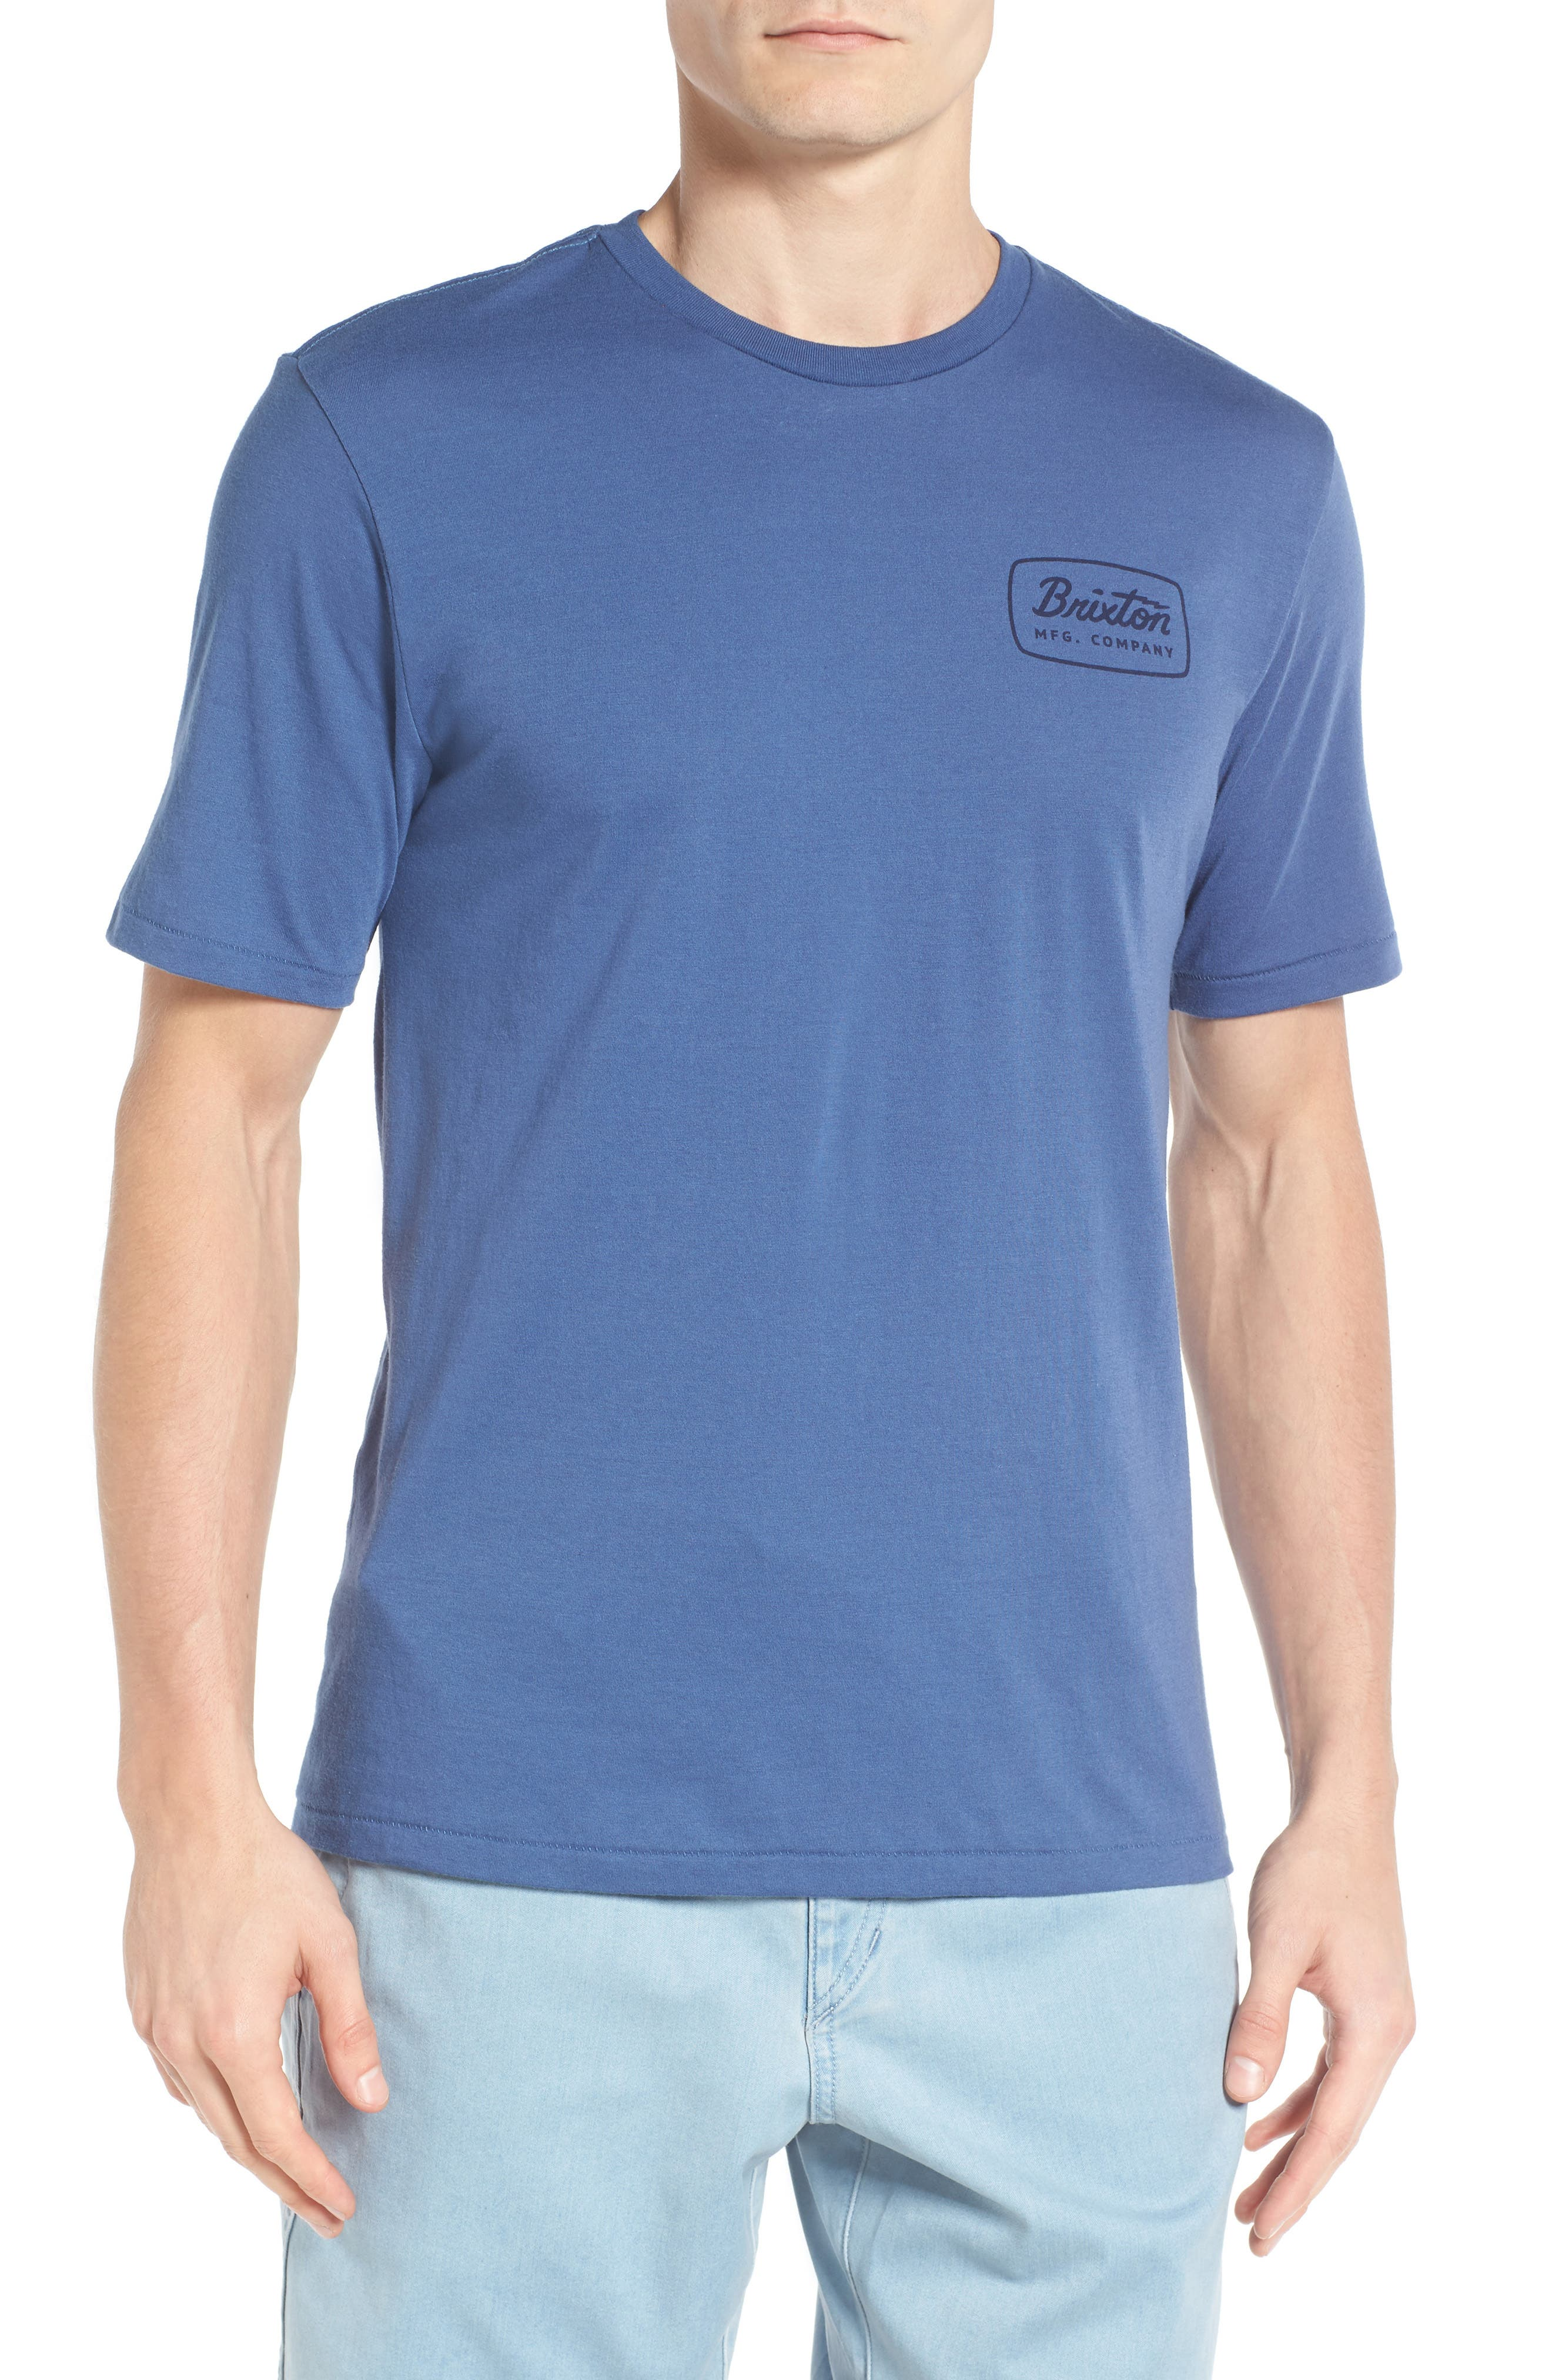 Brixton Jolt Graphic T-Shirt